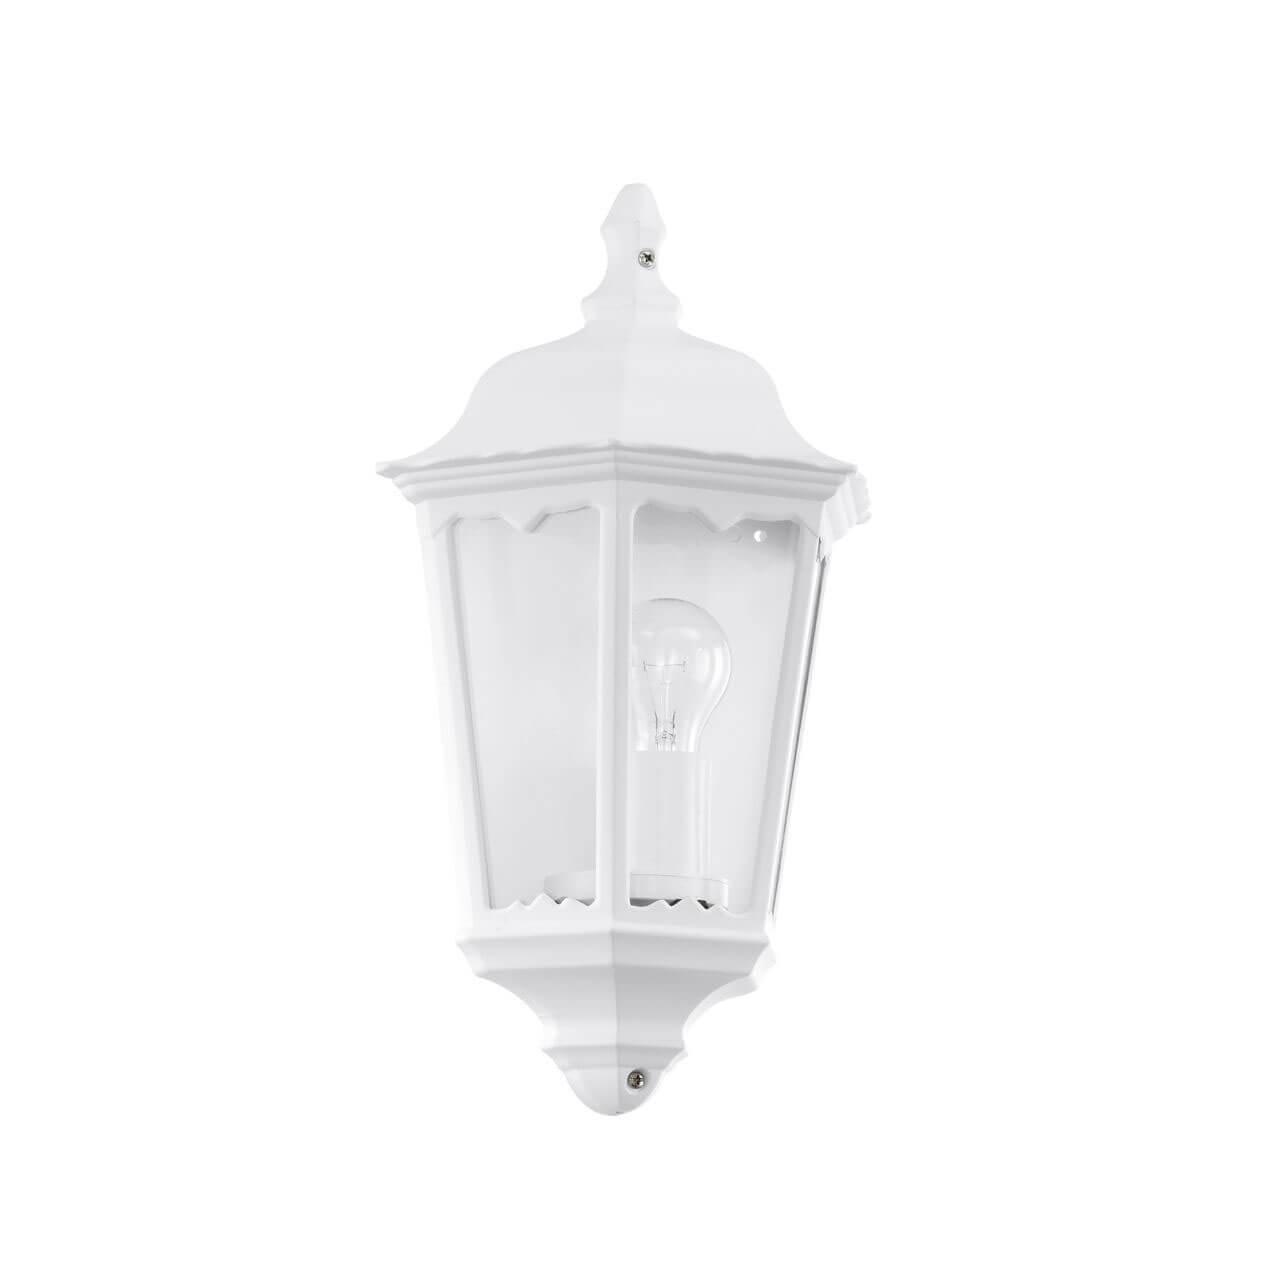 Уличный светильник Eglo 93448, E27 цена